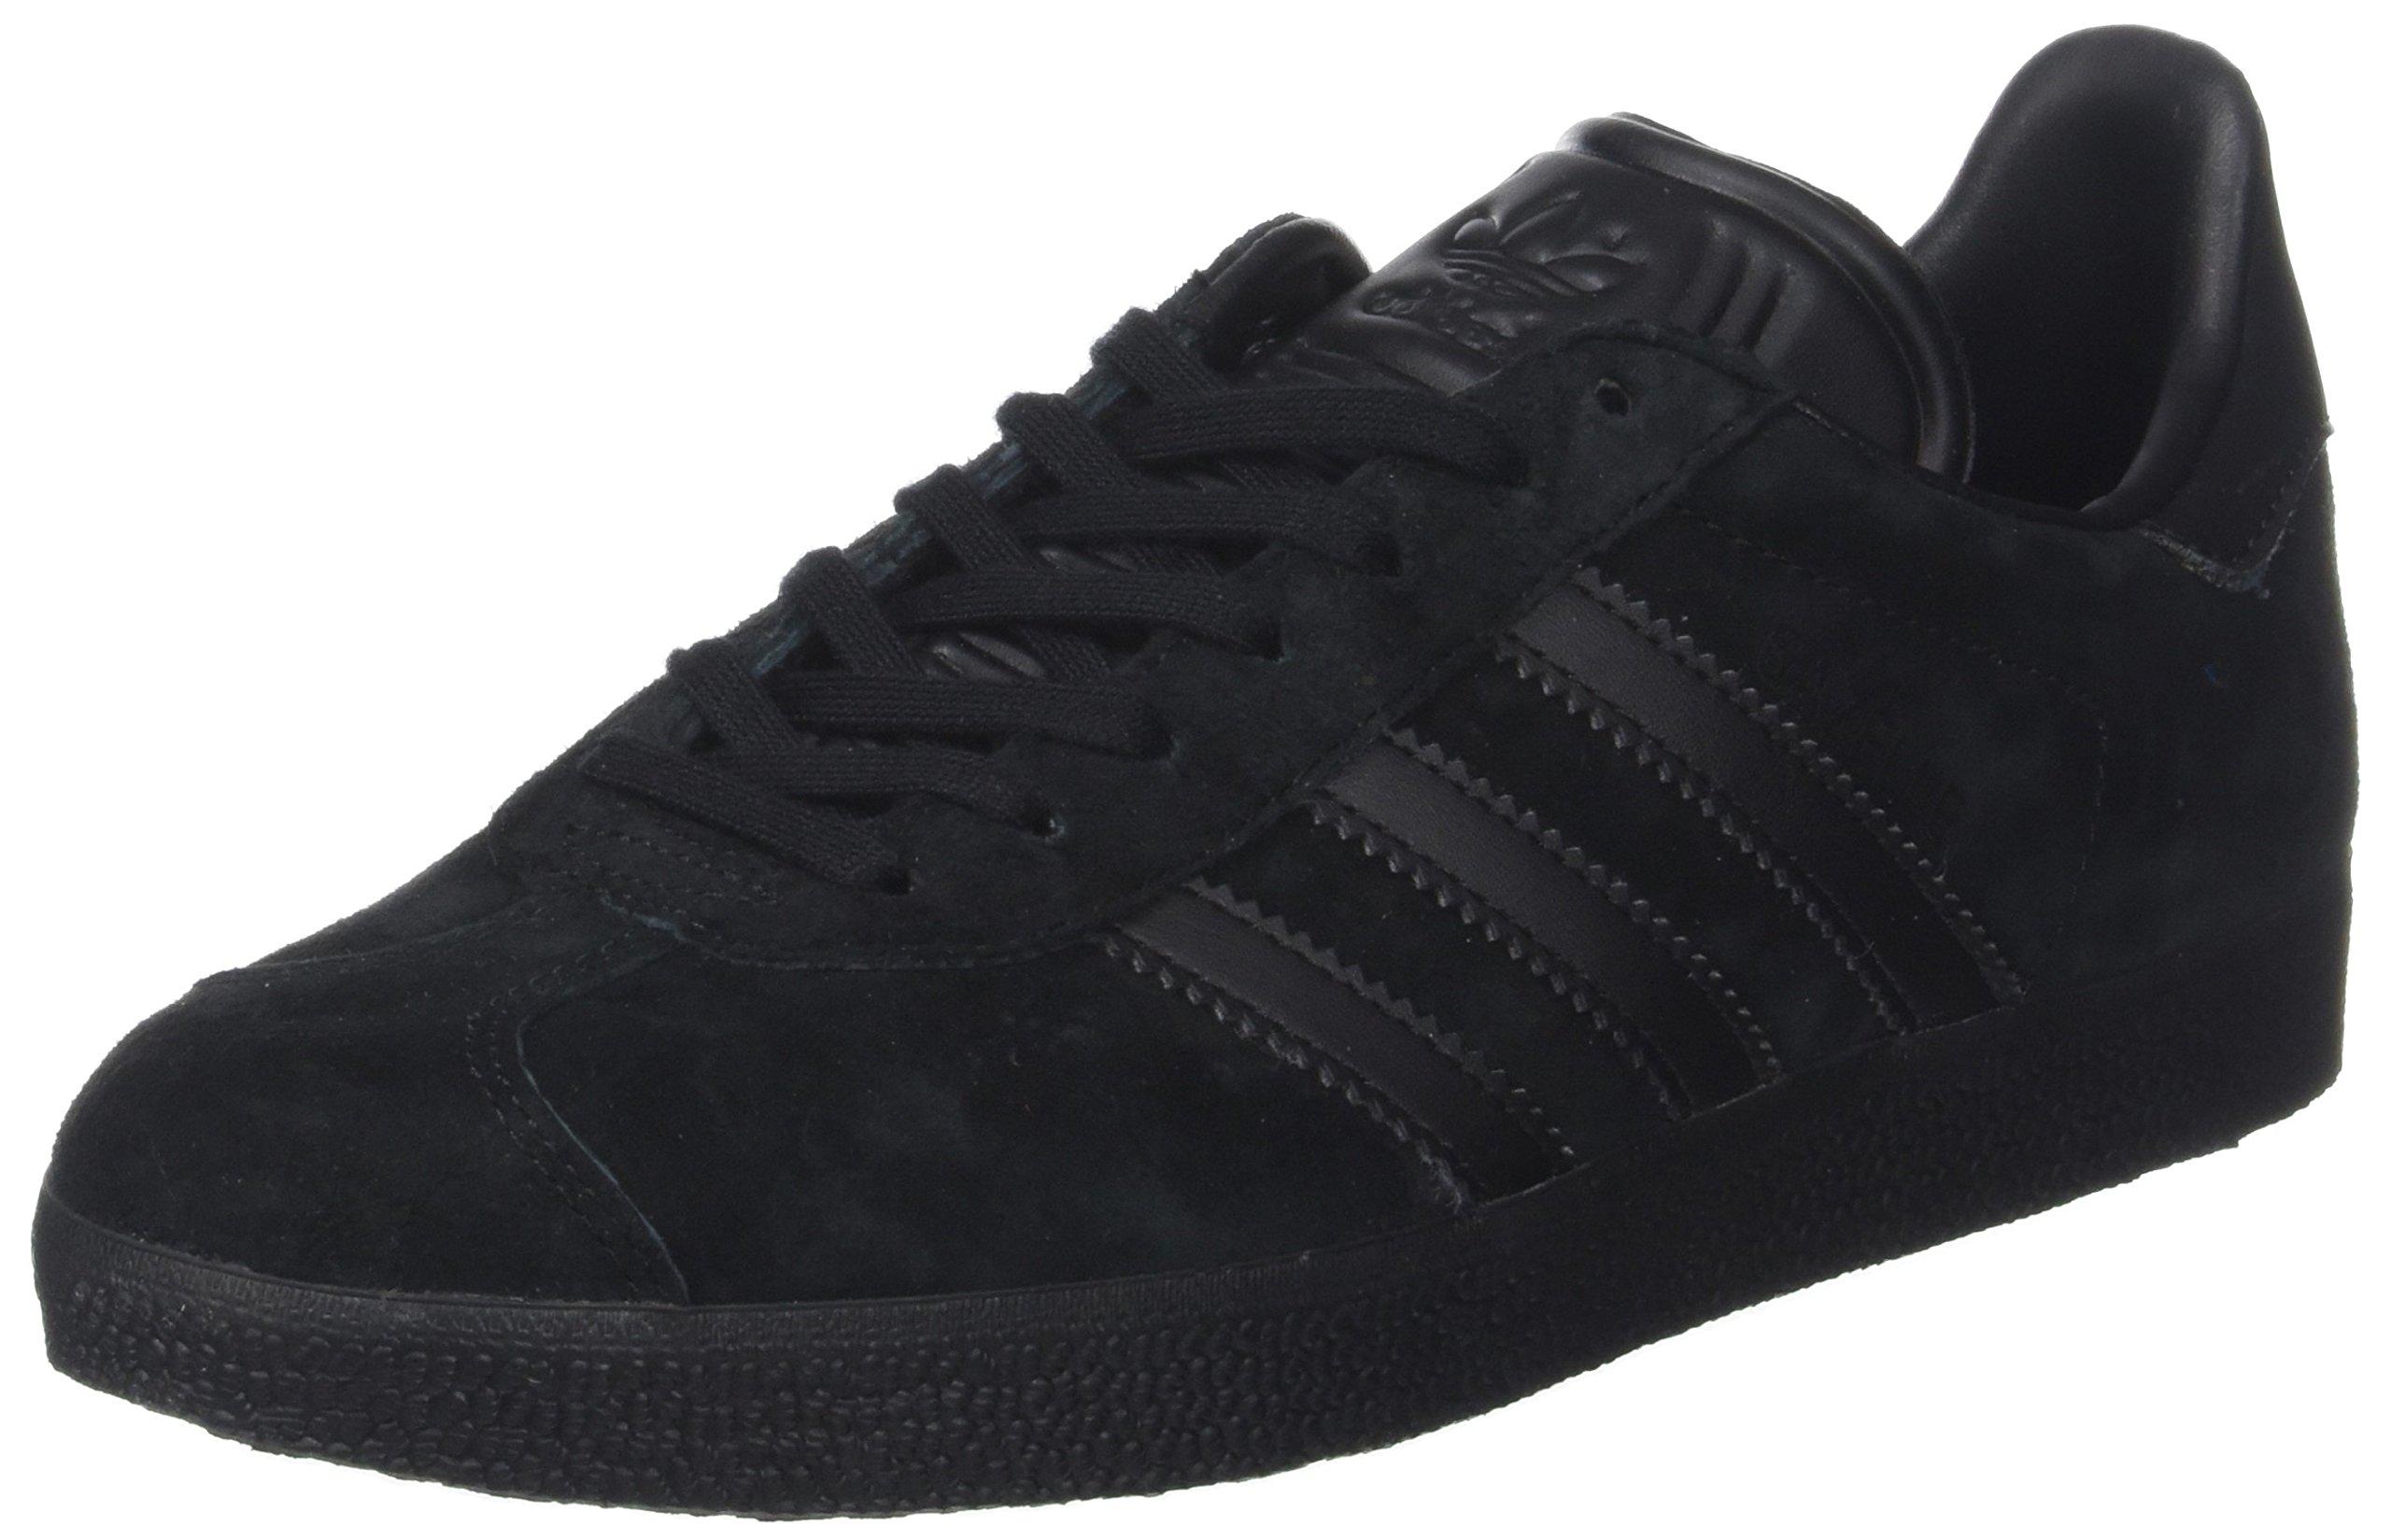 adidas men s gazelle gymnastics shoes